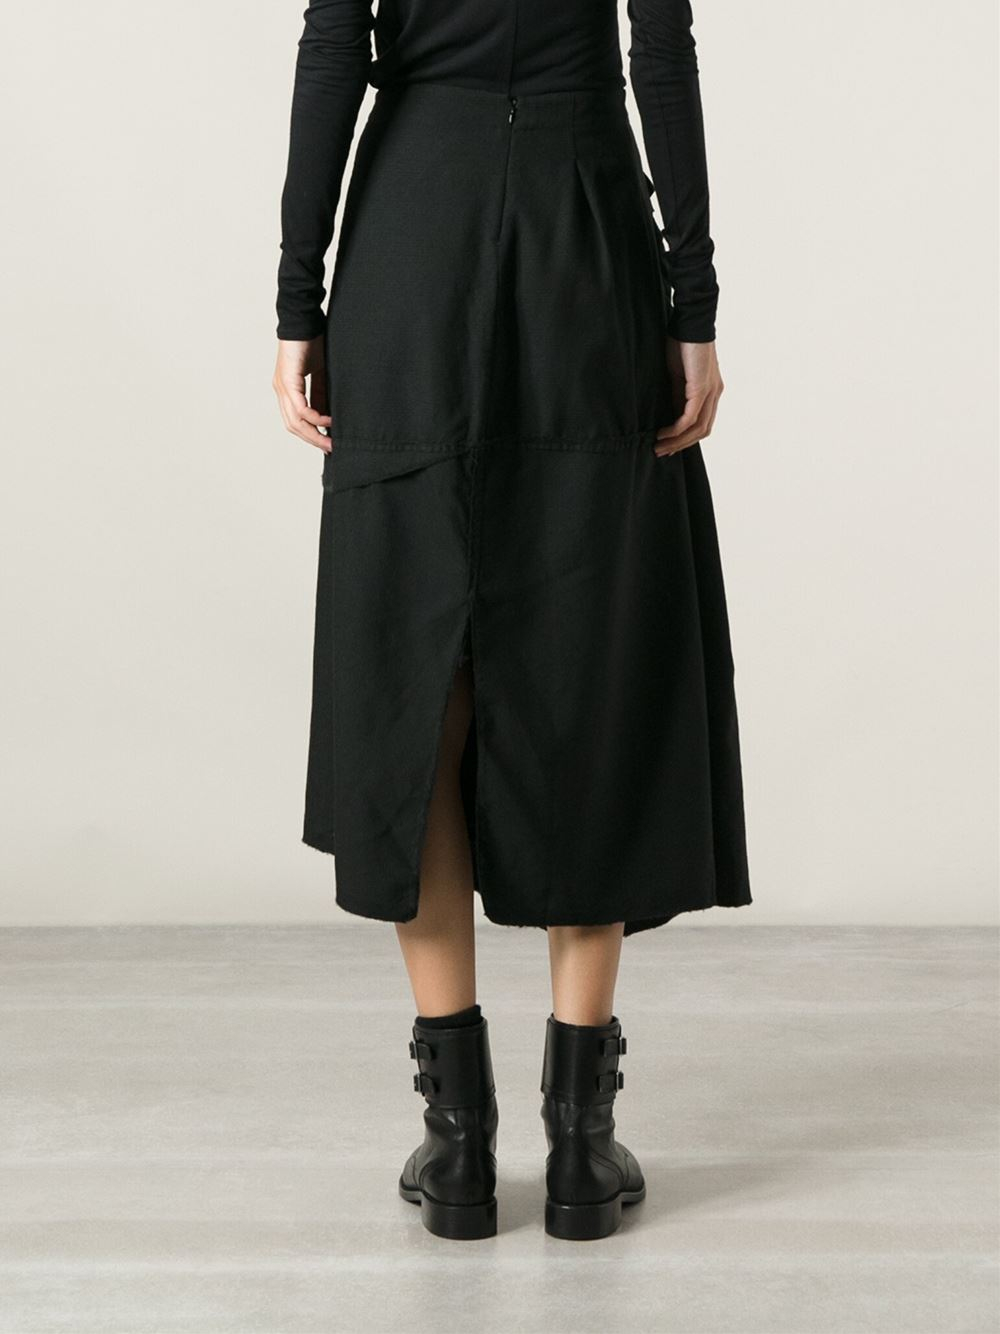 Marc Le Bihan Asymmetric Skirt in Black